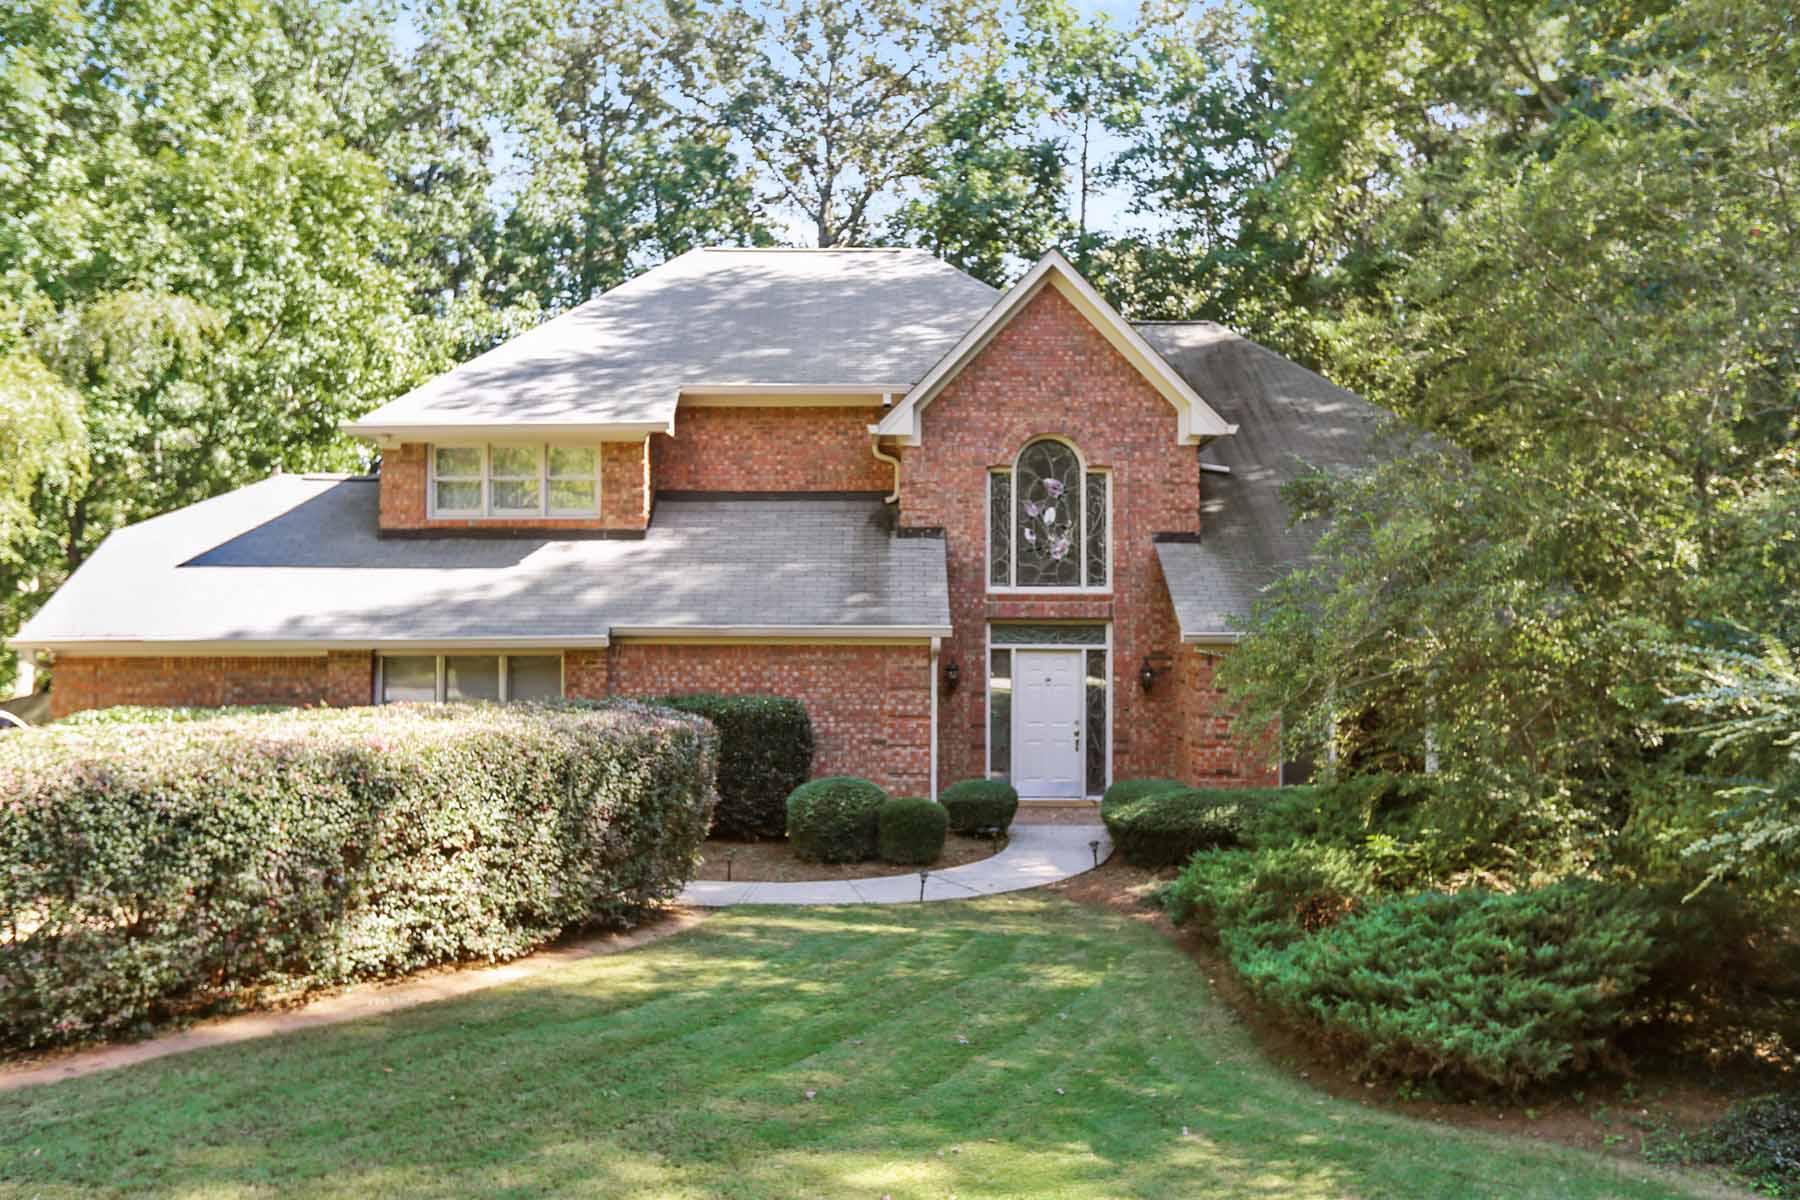 Nhà ở một gia đình vì Bán tại Large Home in Alpharetta 5190 Cameron Forest Parkway Alpharetta, Georgia, 30022 Hoa Kỳ